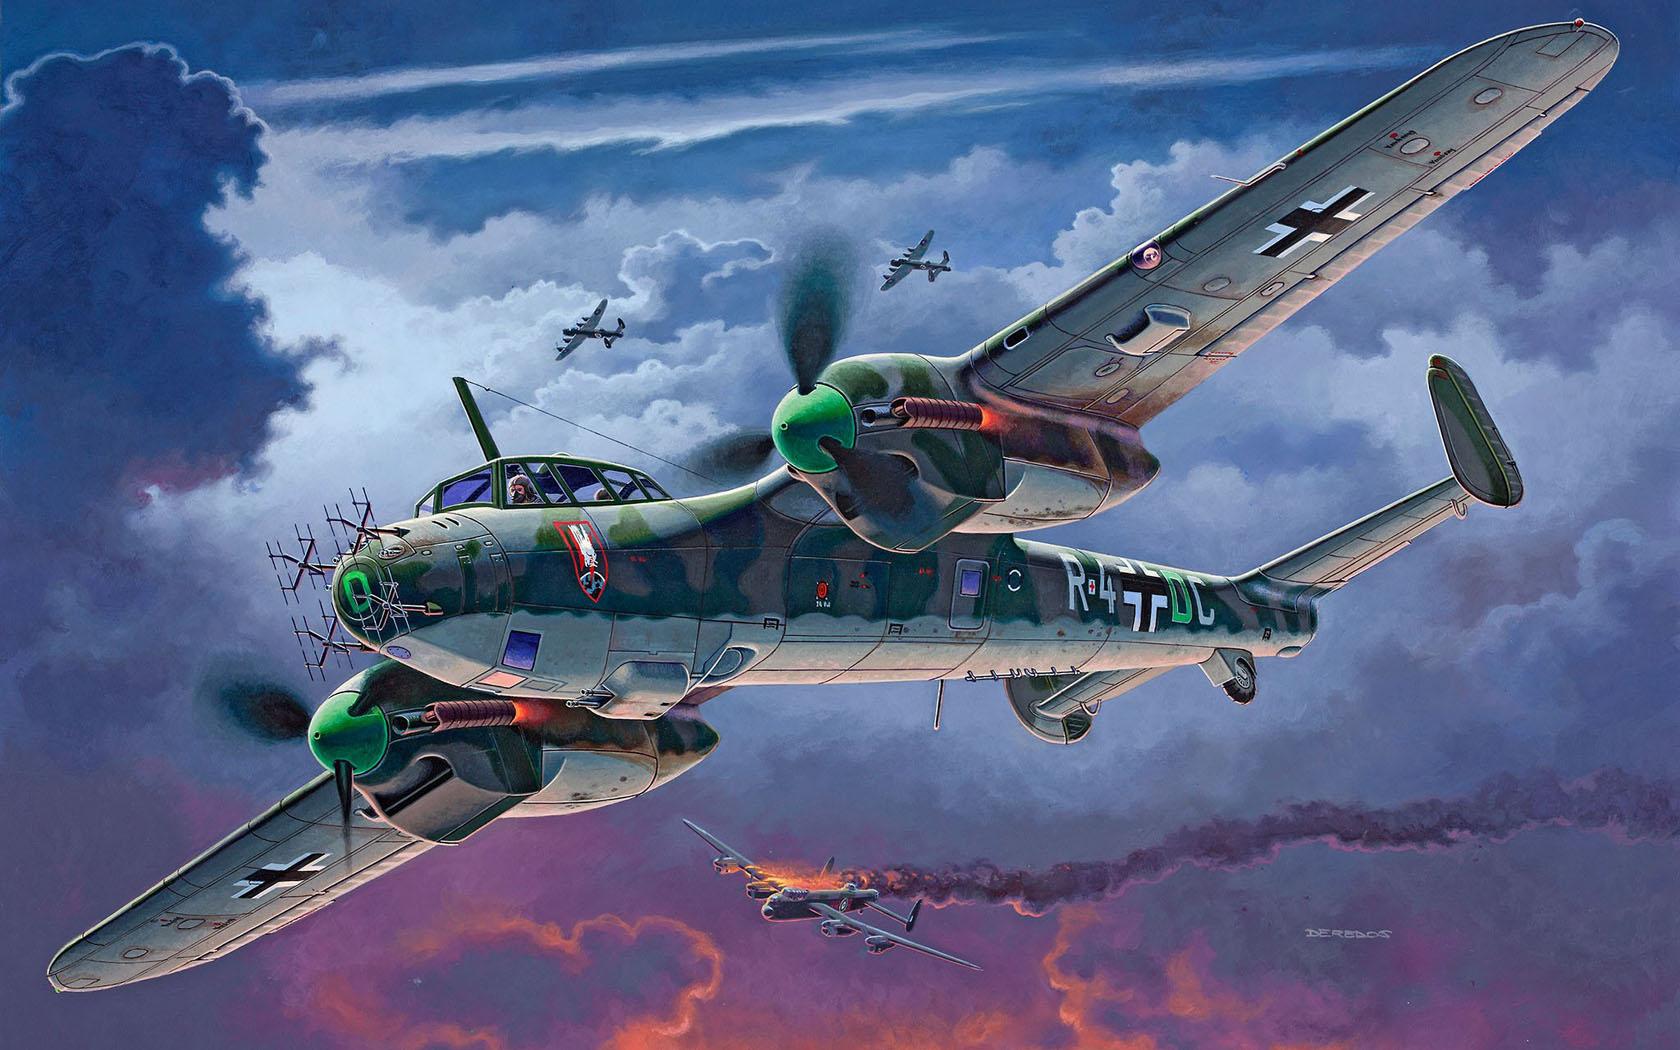 Deredos Andrzej. Разведчик-бомбардировщик Dornier Do-215 B-5 Nightfighter.